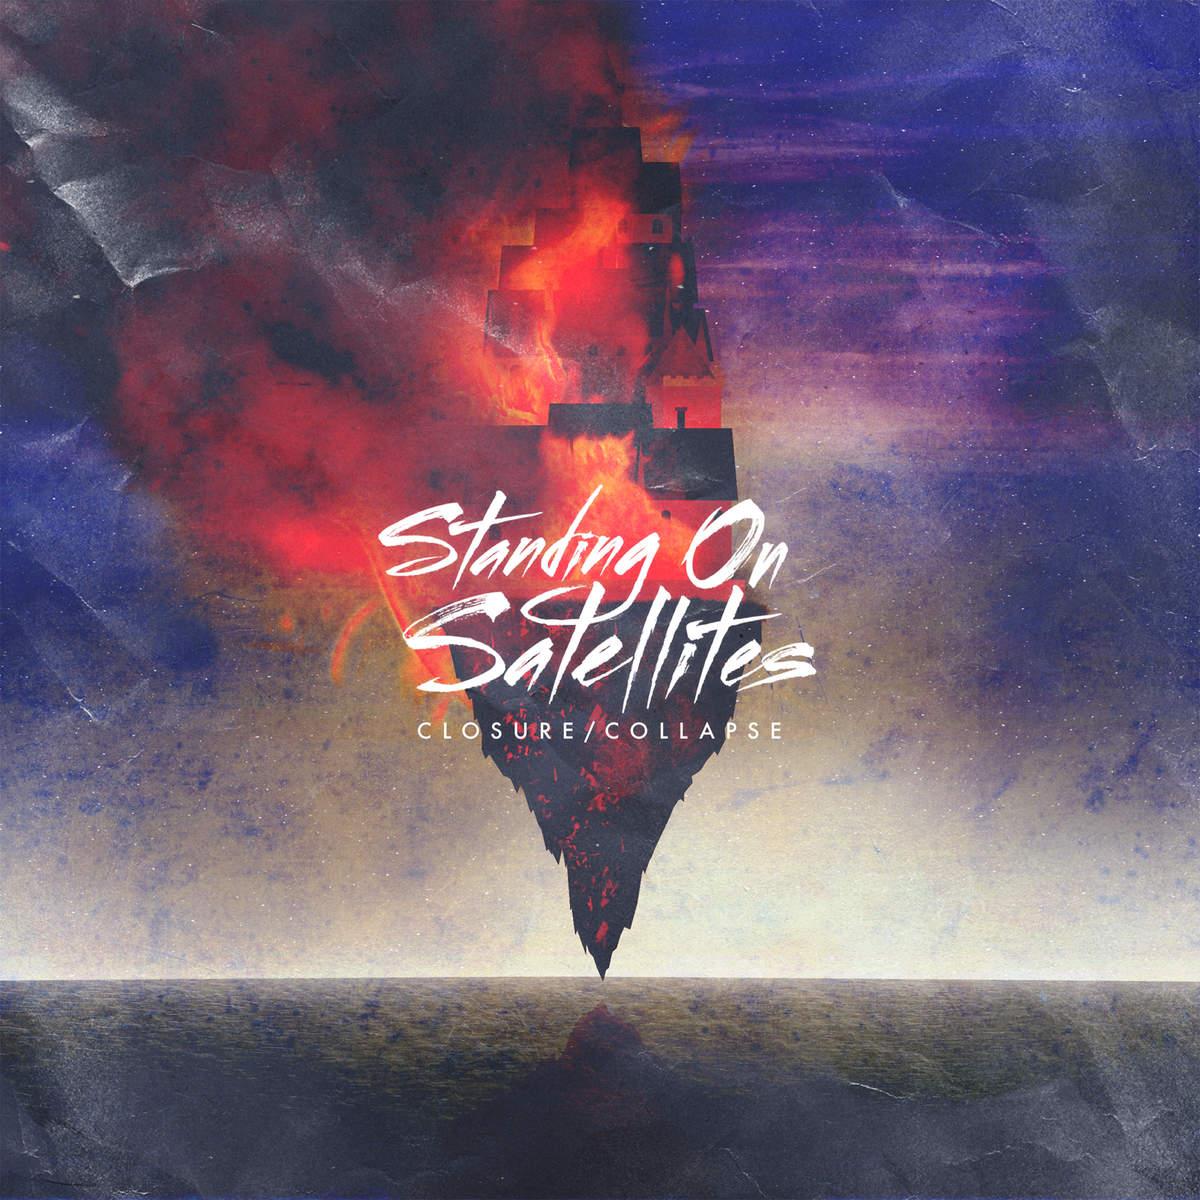 Standing on Satellites - Closure/Collapse [EP] (2014)